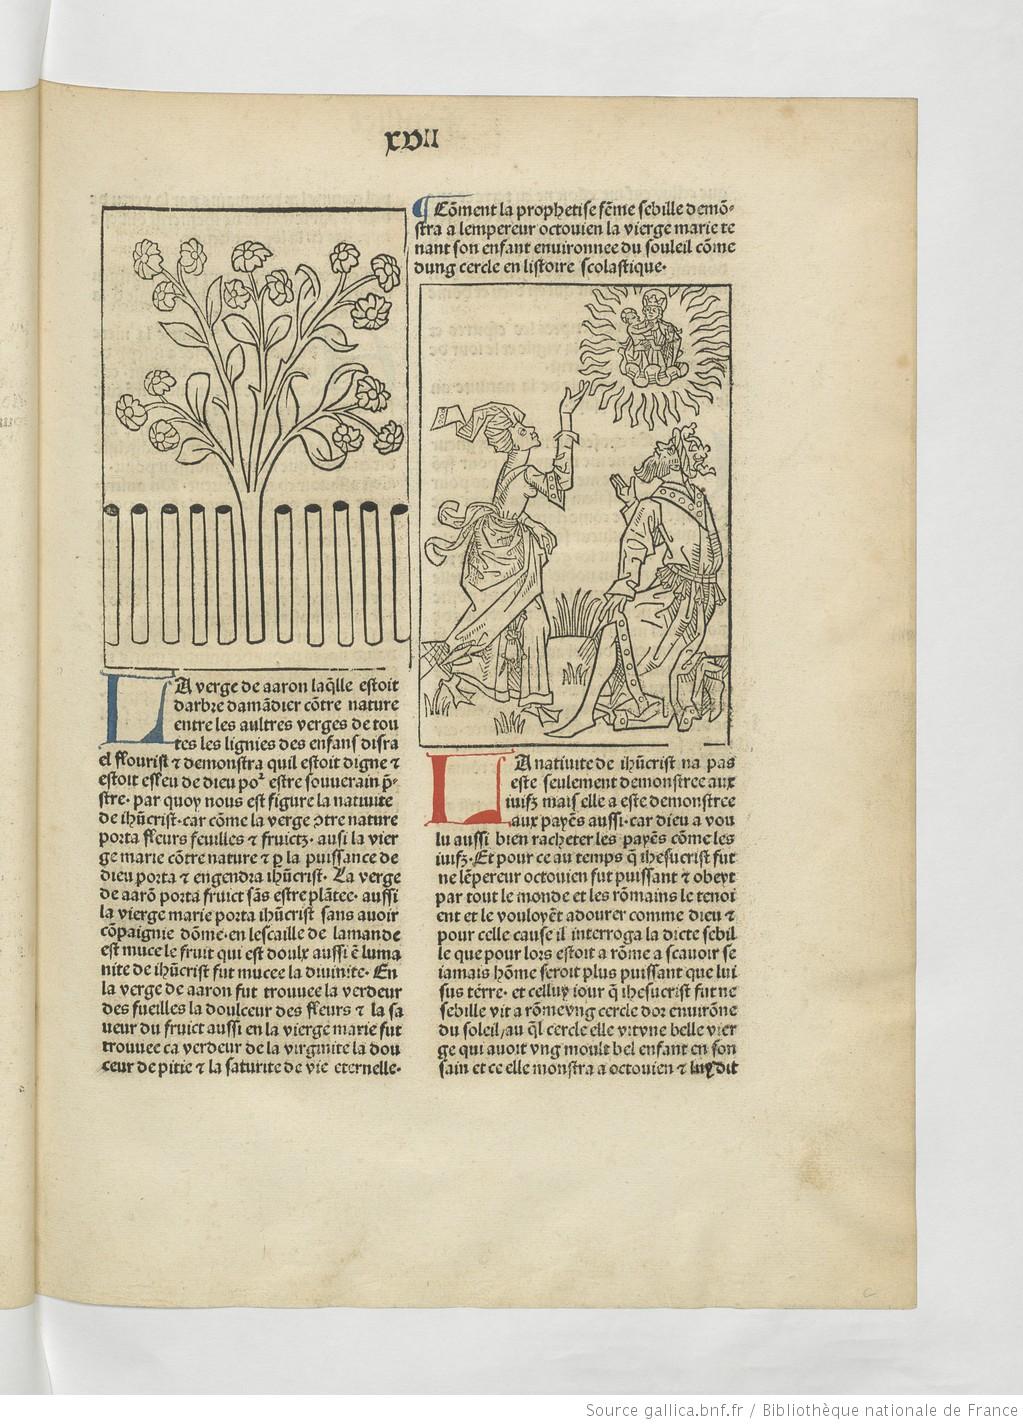 1482 Mirouer de la redempcion de l'umain lignage Reserve des livres rares, Res. A 1243 Gallica